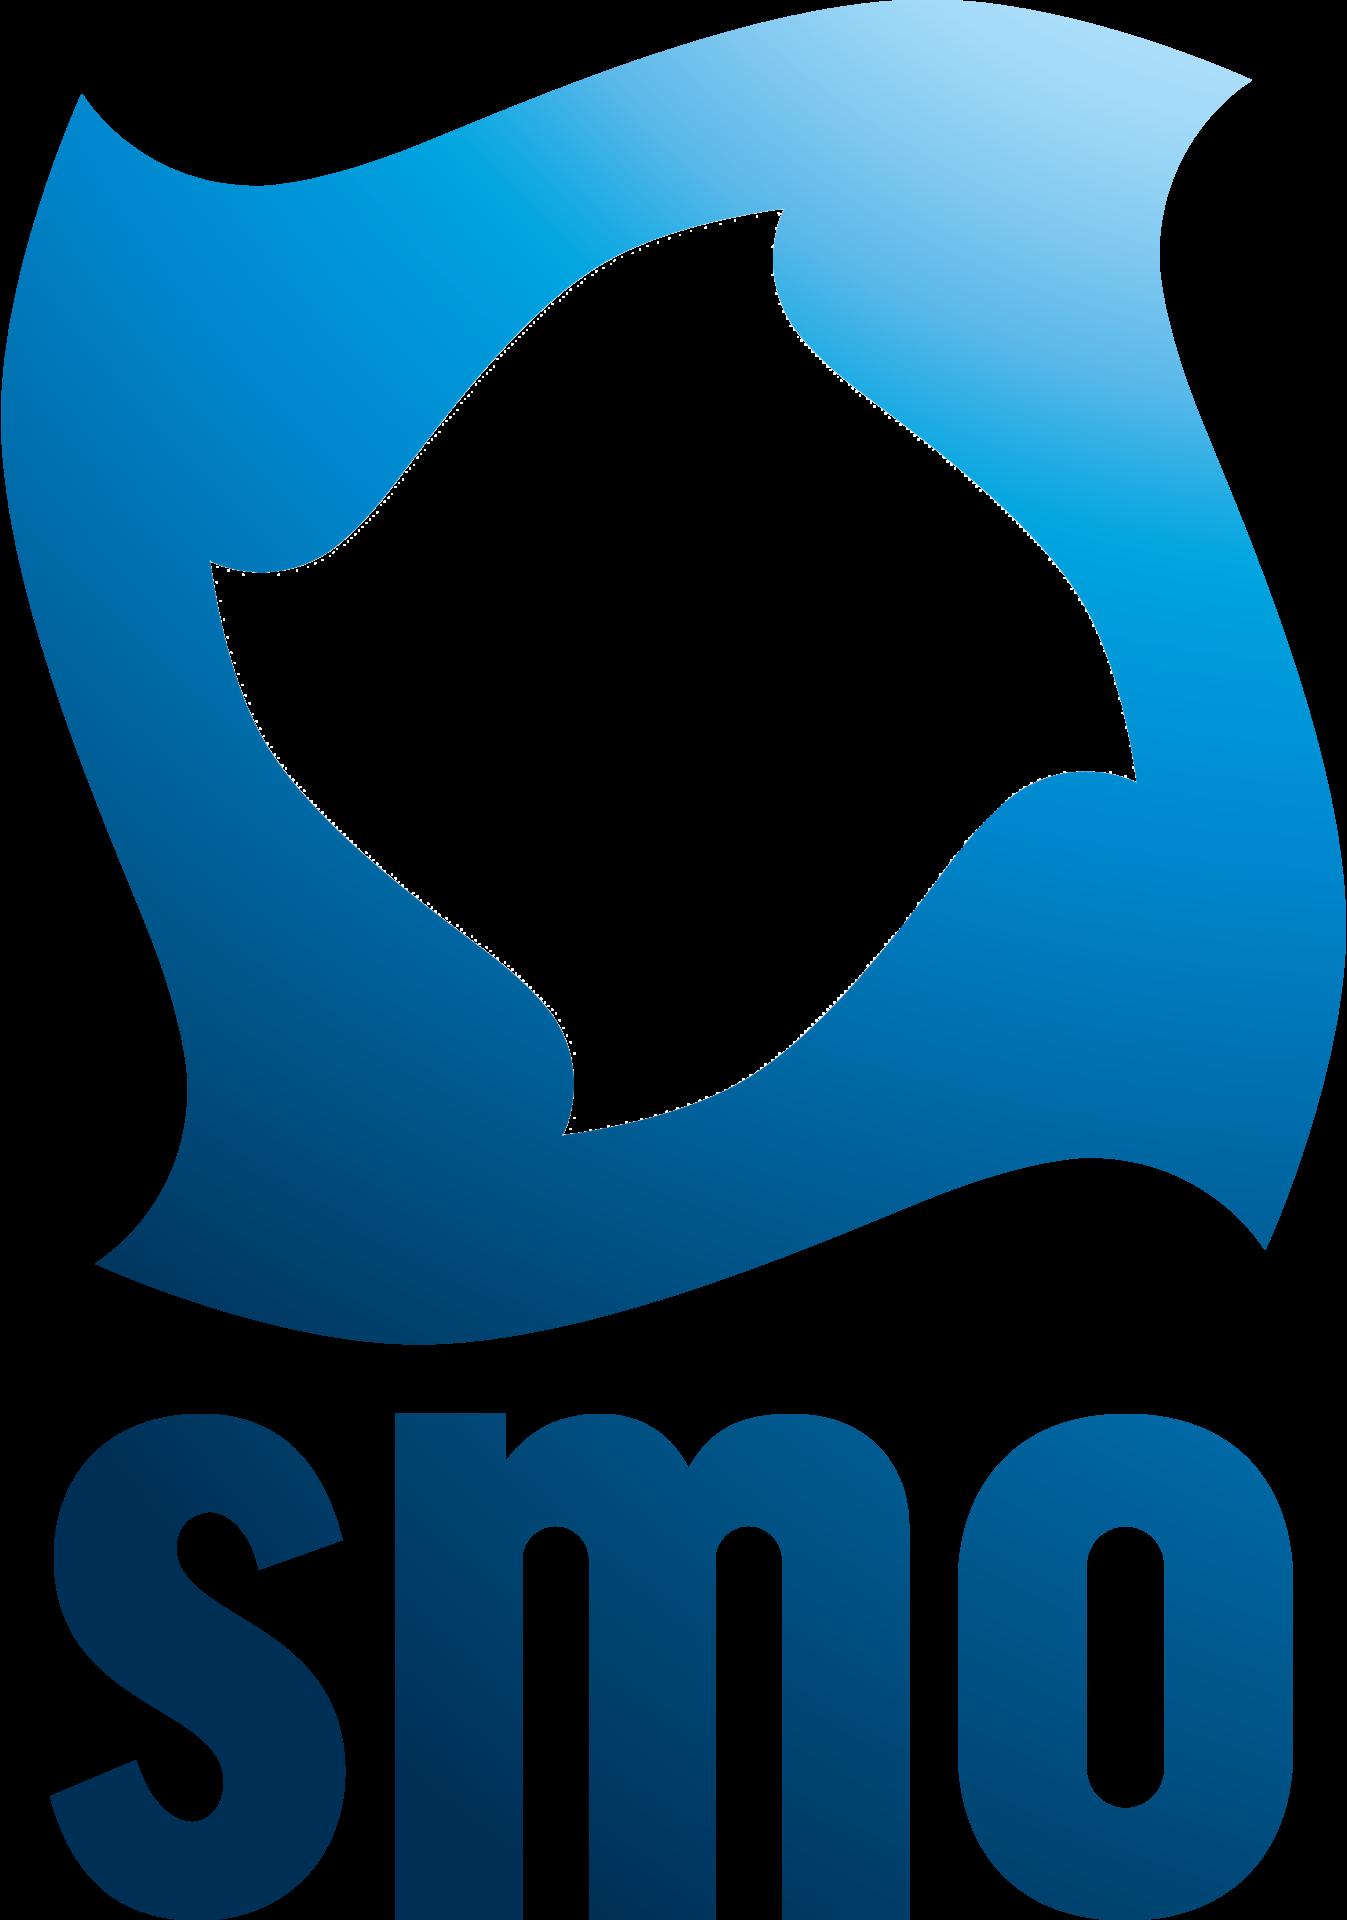 SMO-logo-png-11